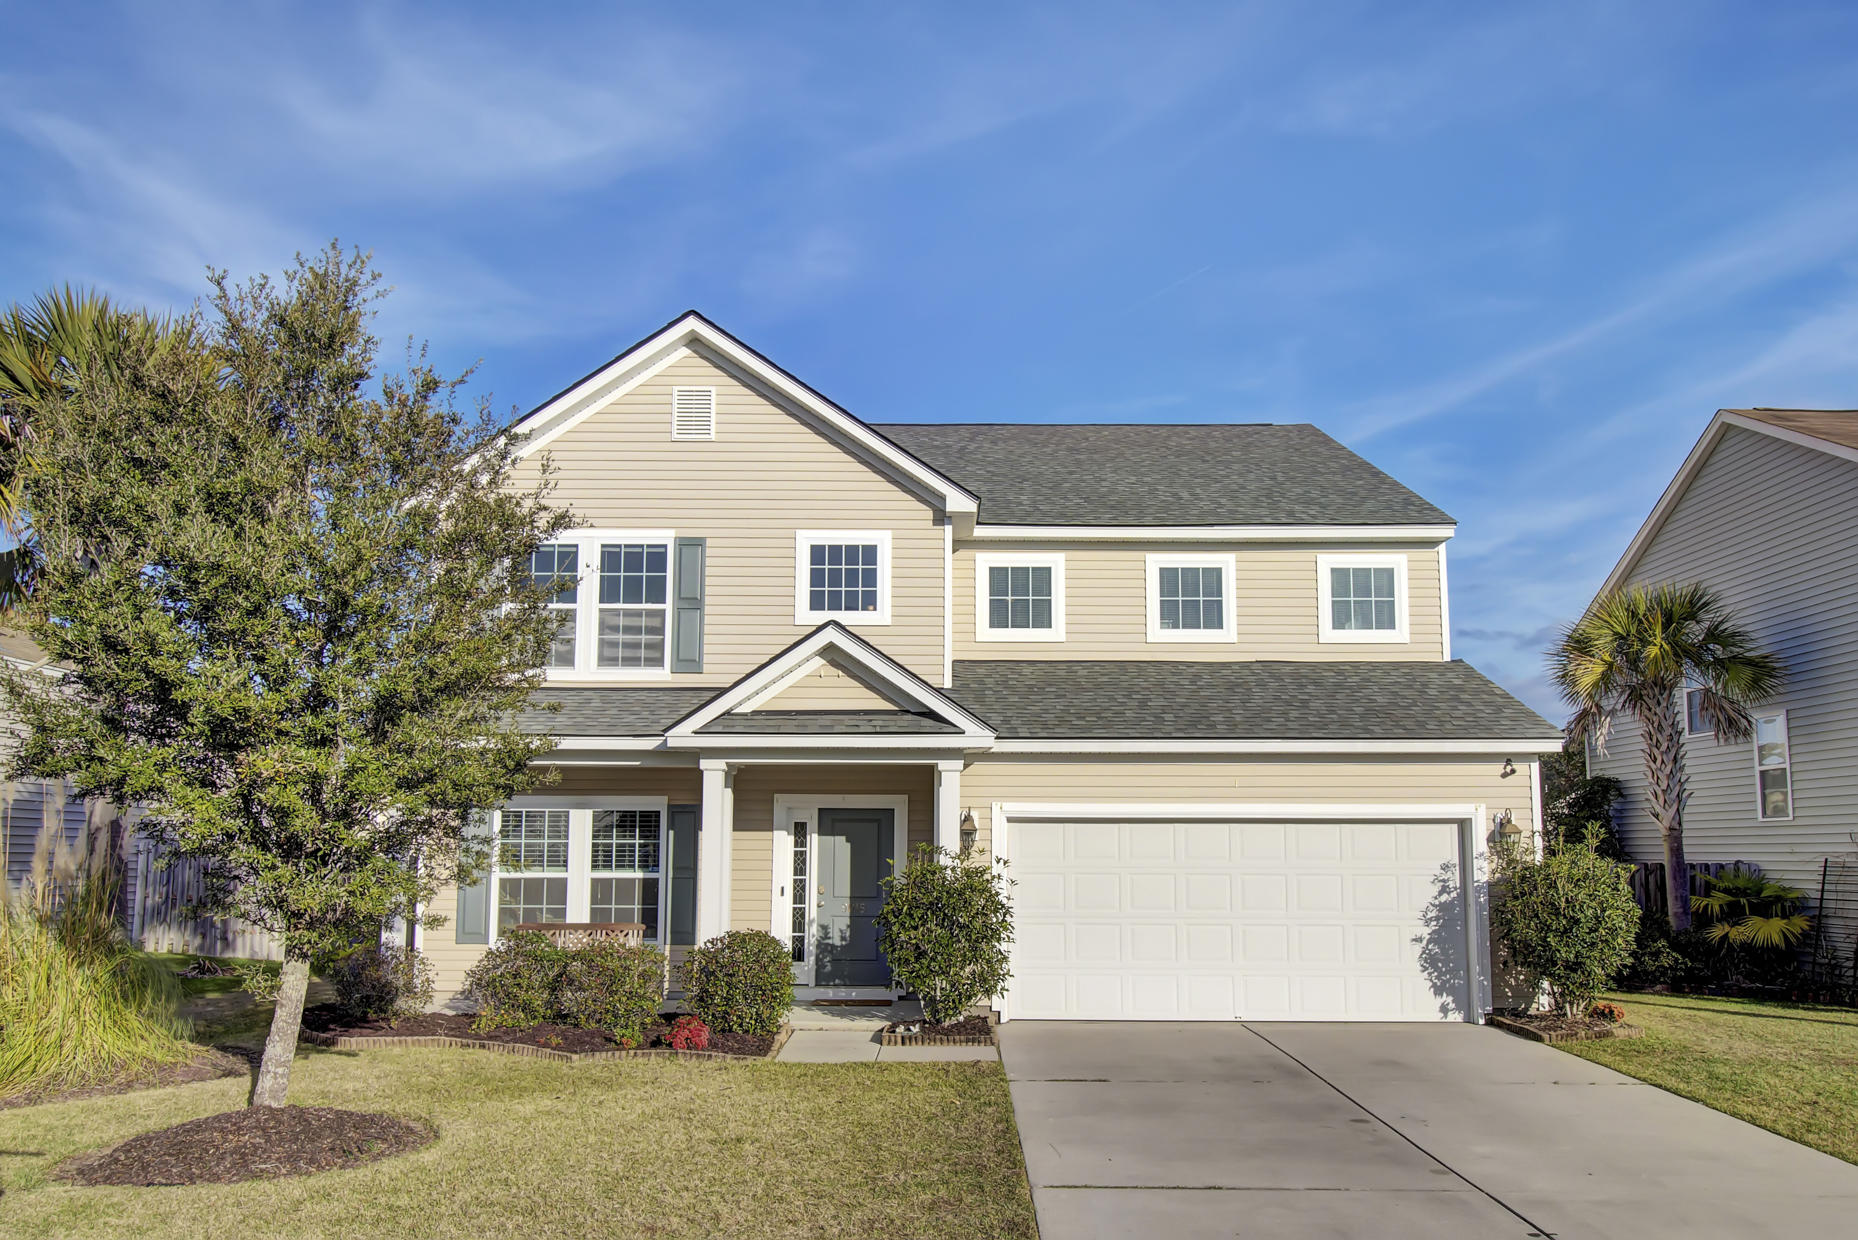 Myers Mill Homes For Sale - 9015 Hema Lane, Summerville, SC - 0